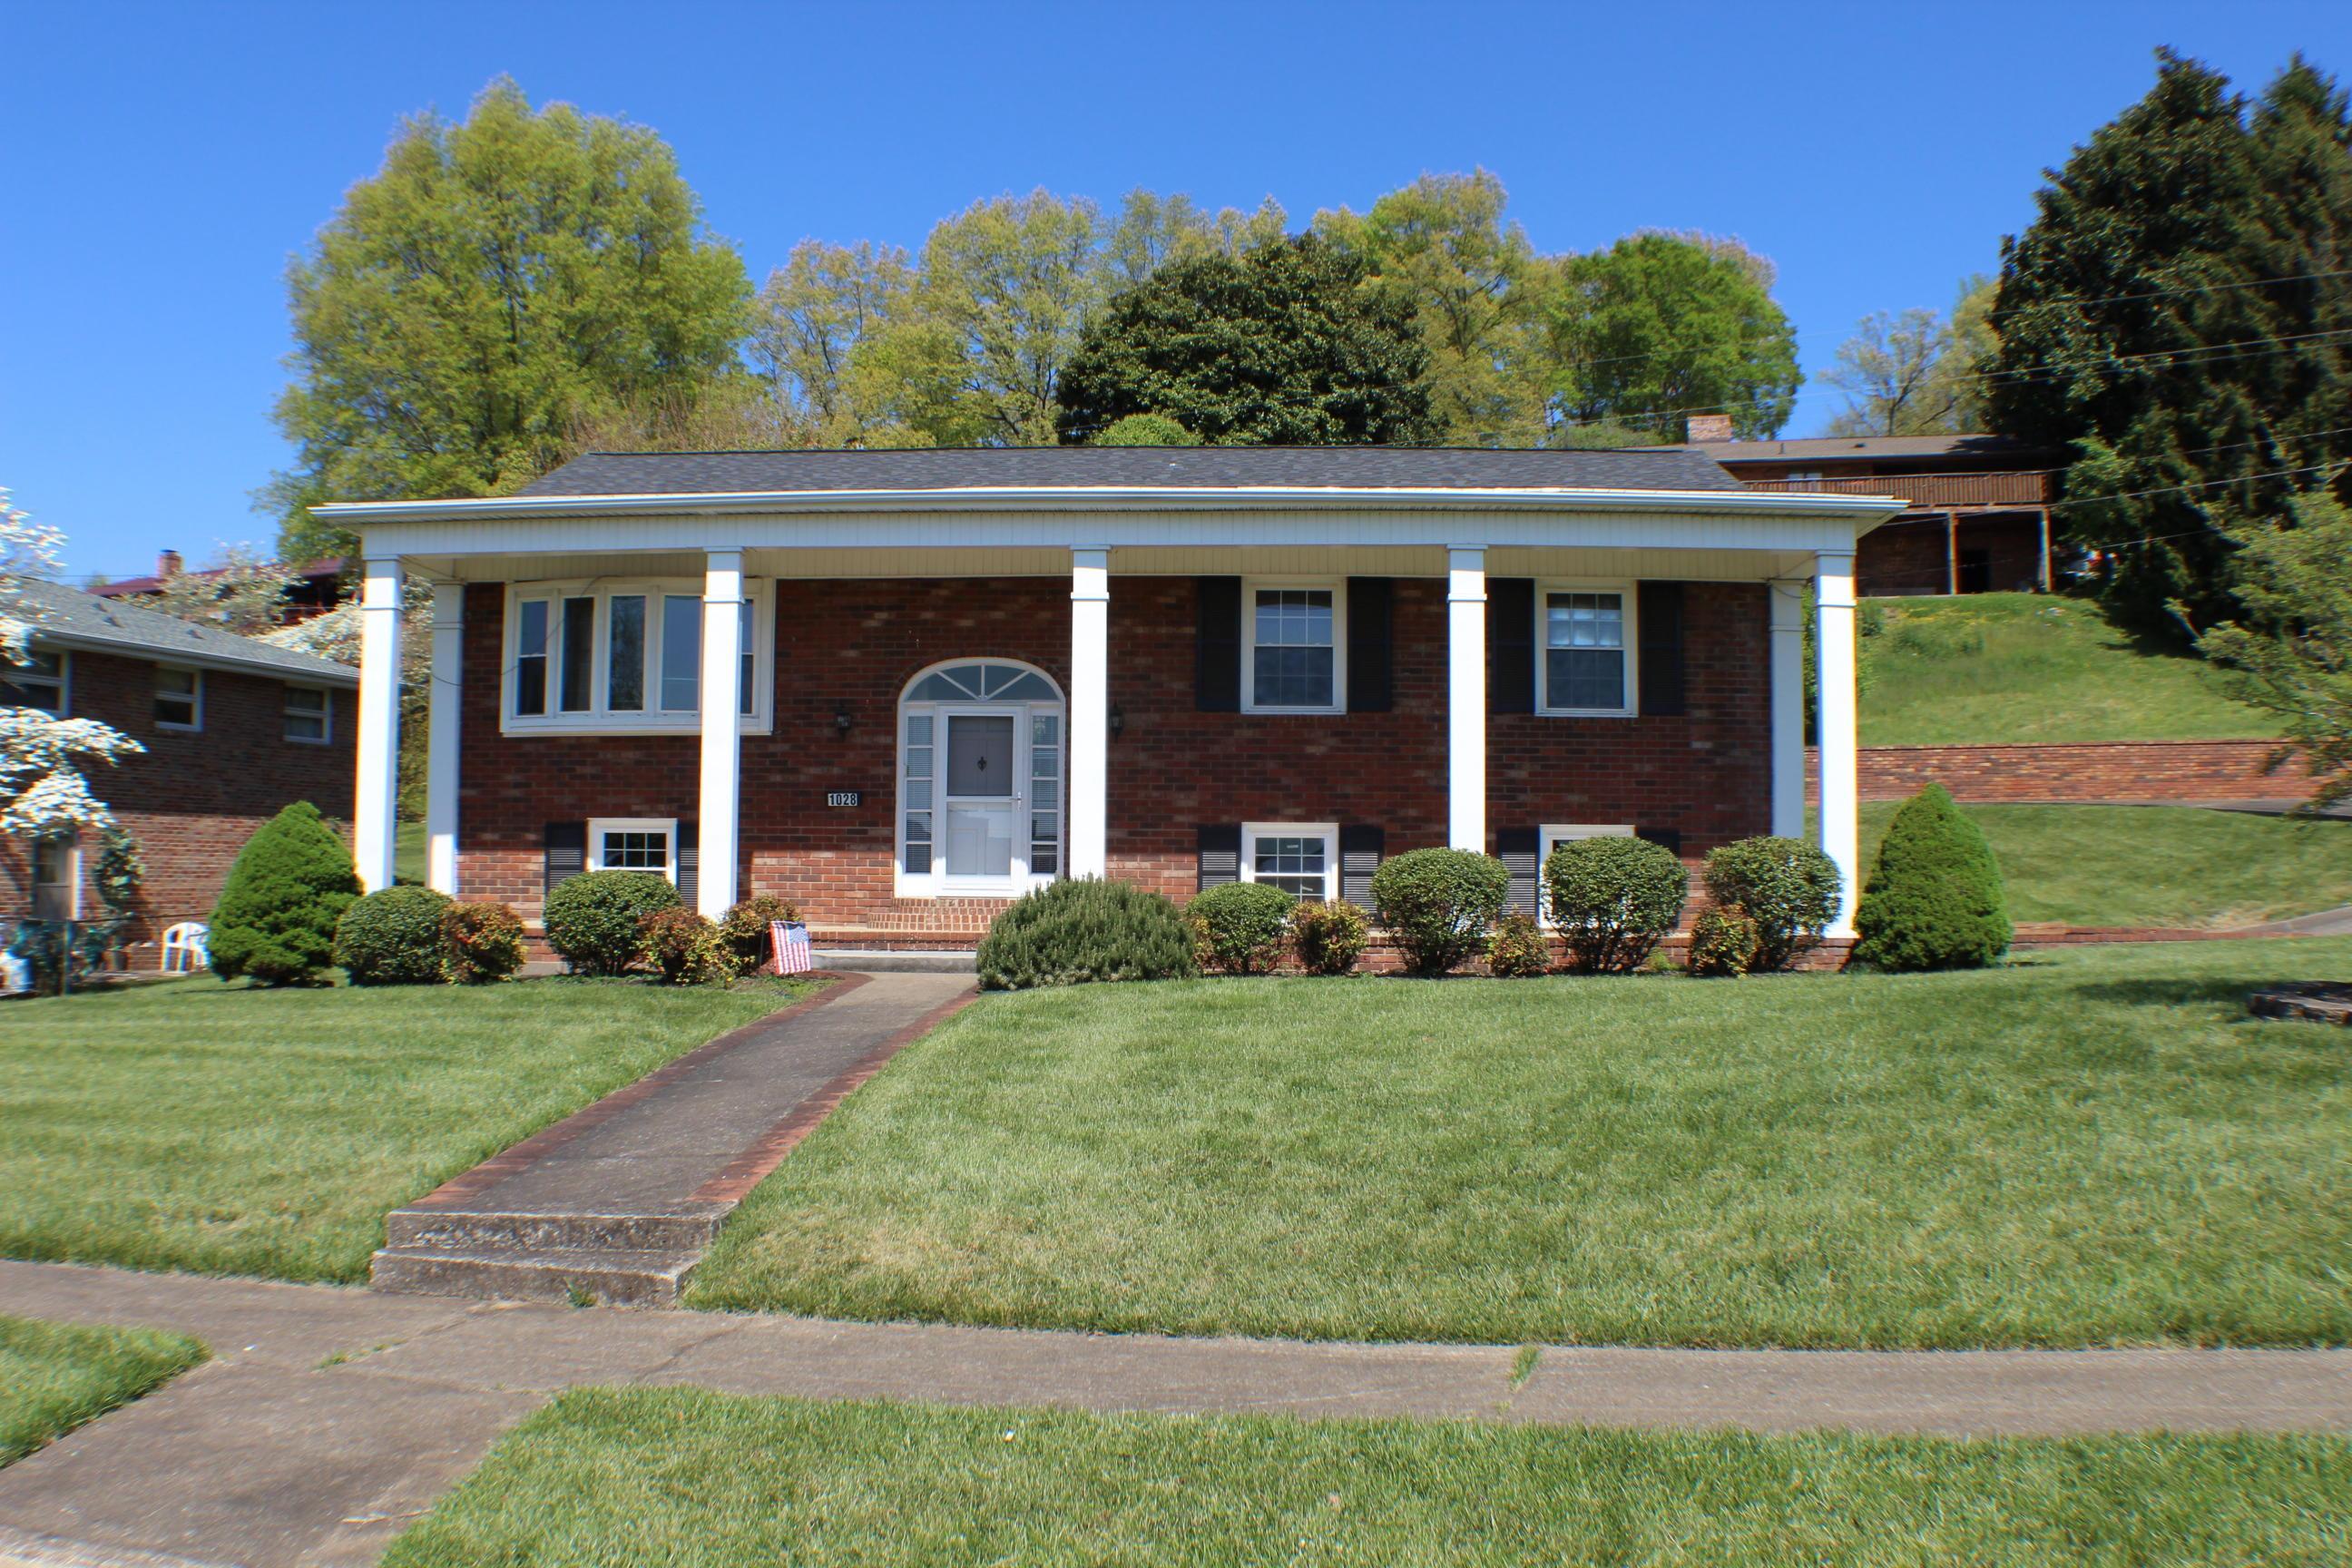 1028 Lake Street, Kingsport, Tennessee 37660, 5 Bedrooms Bedrooms, ,3 BathroomsBathrooms,Single Family,For Sale,1028 Lake Street,2,9921247